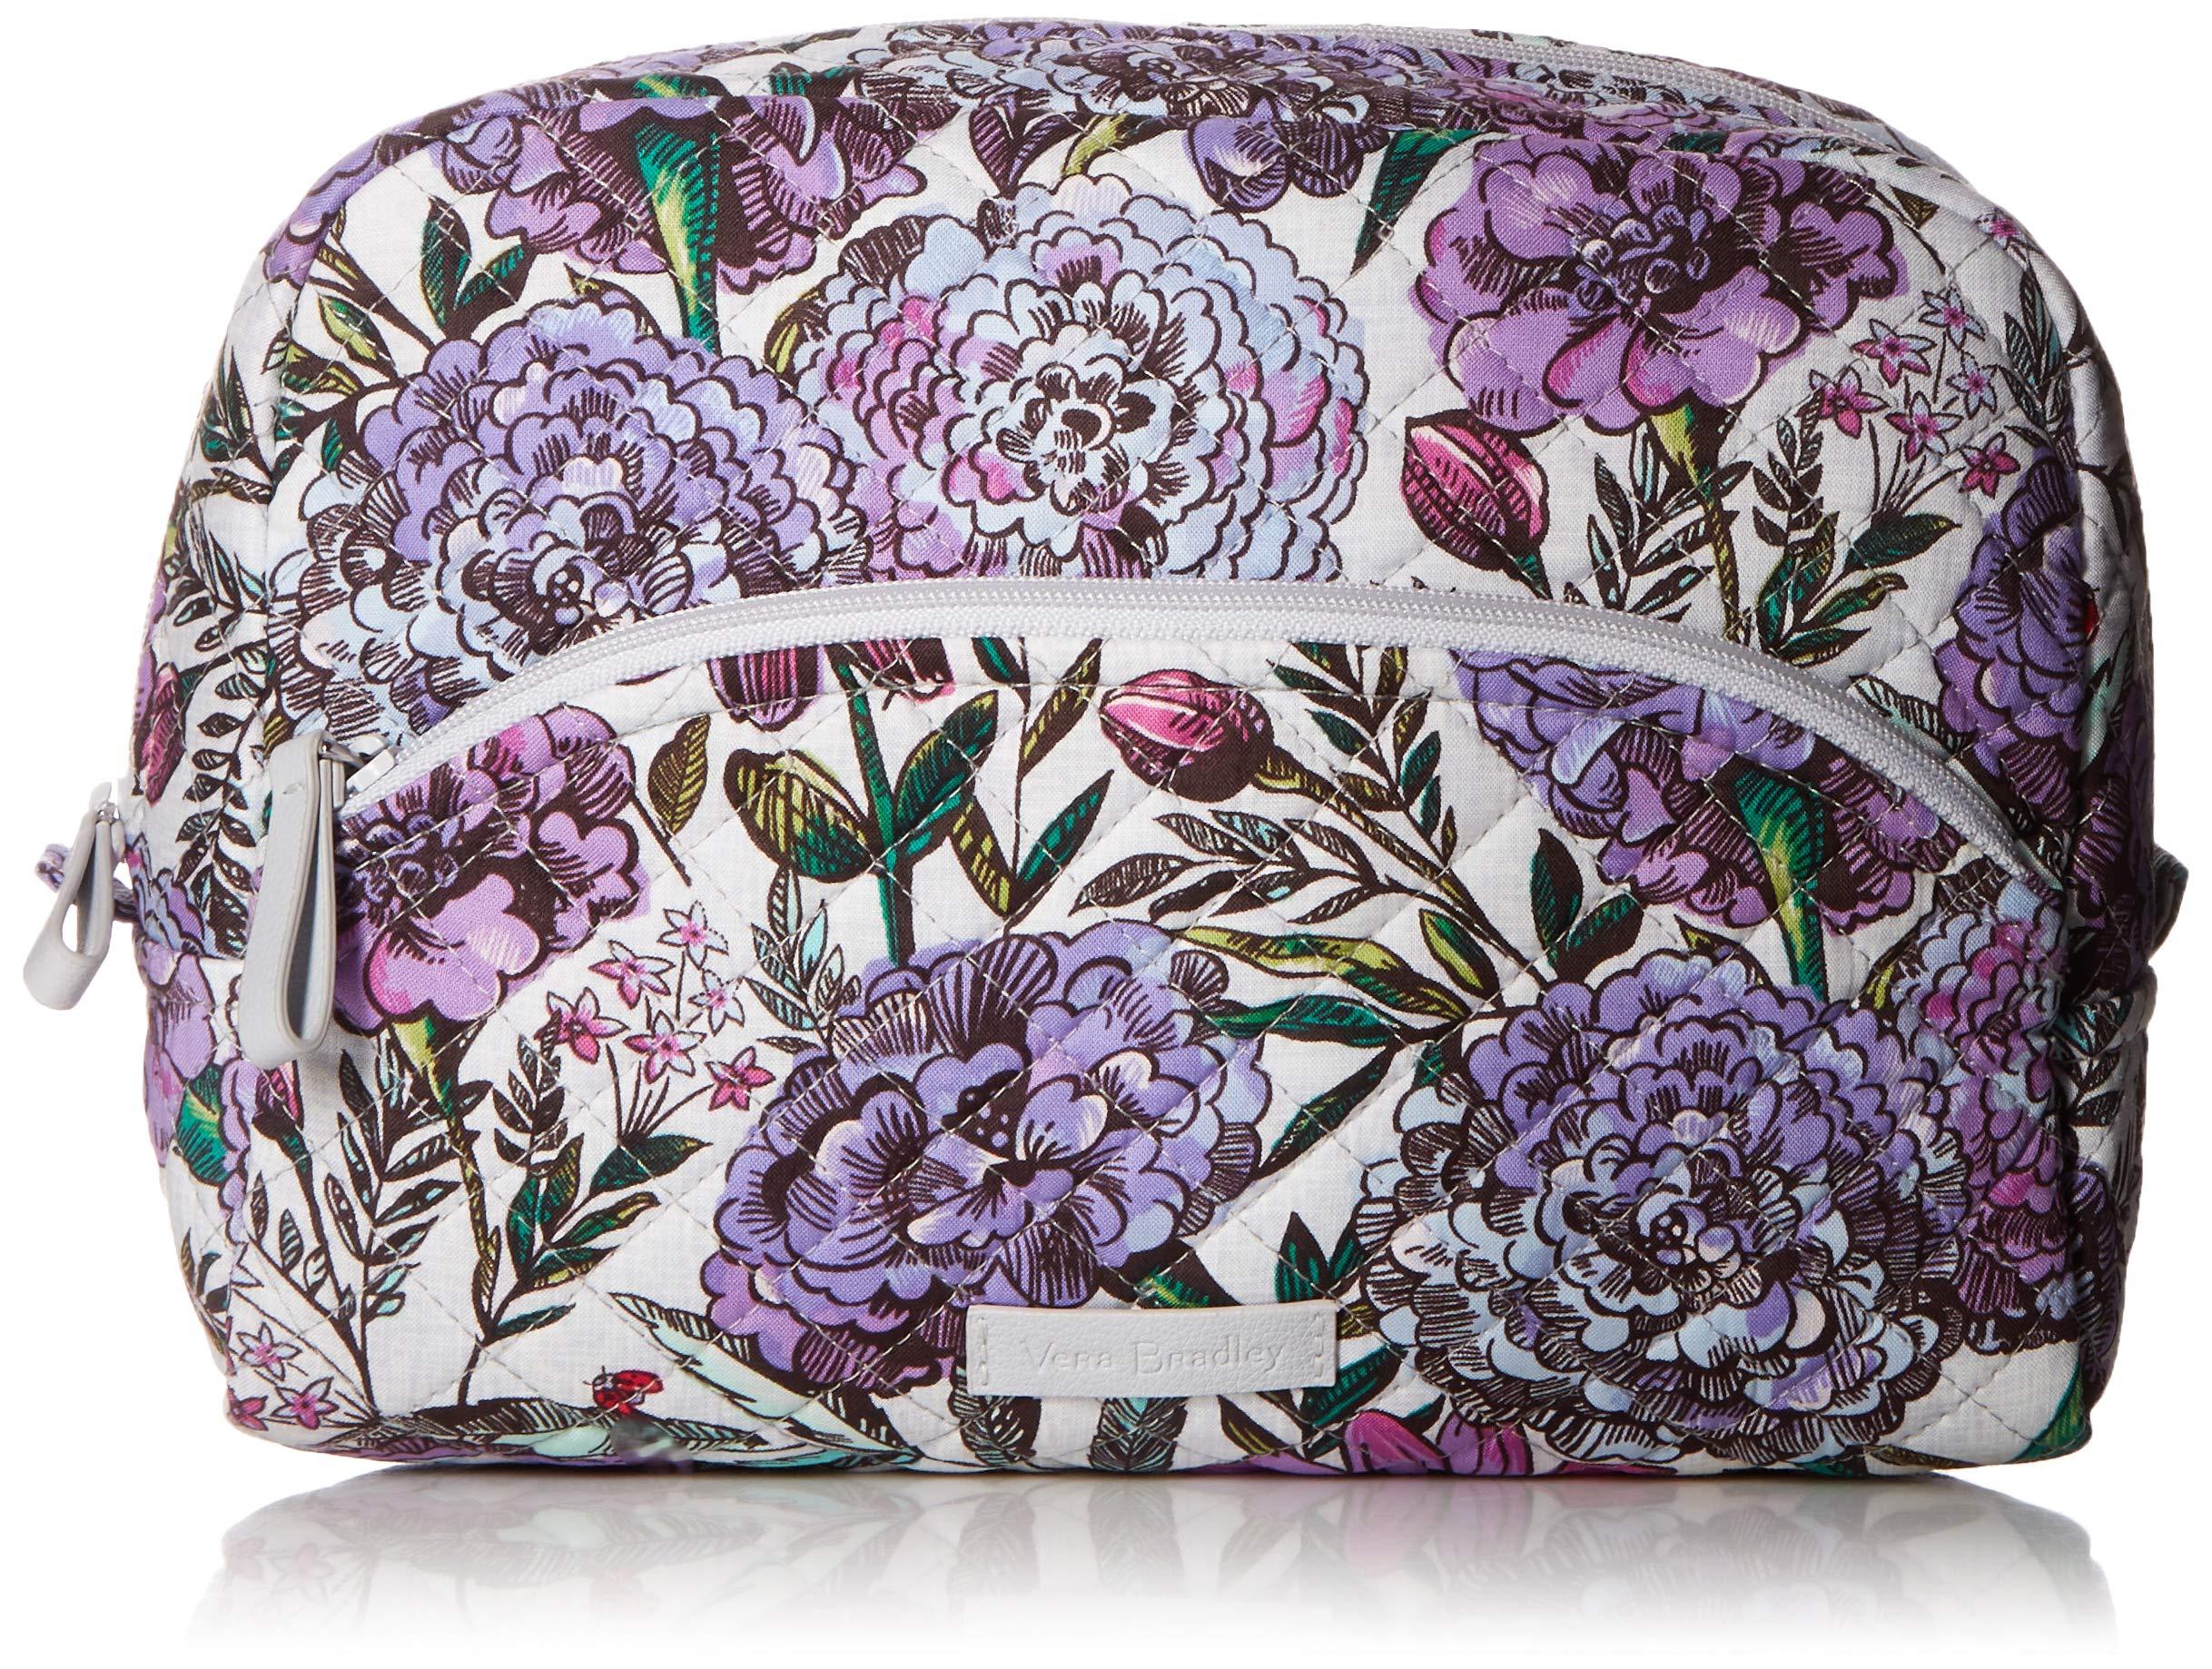 Vera Bradley Iconic Large Cosmetic, Signature Cotton, Lavender Meadow by Vera Bradley